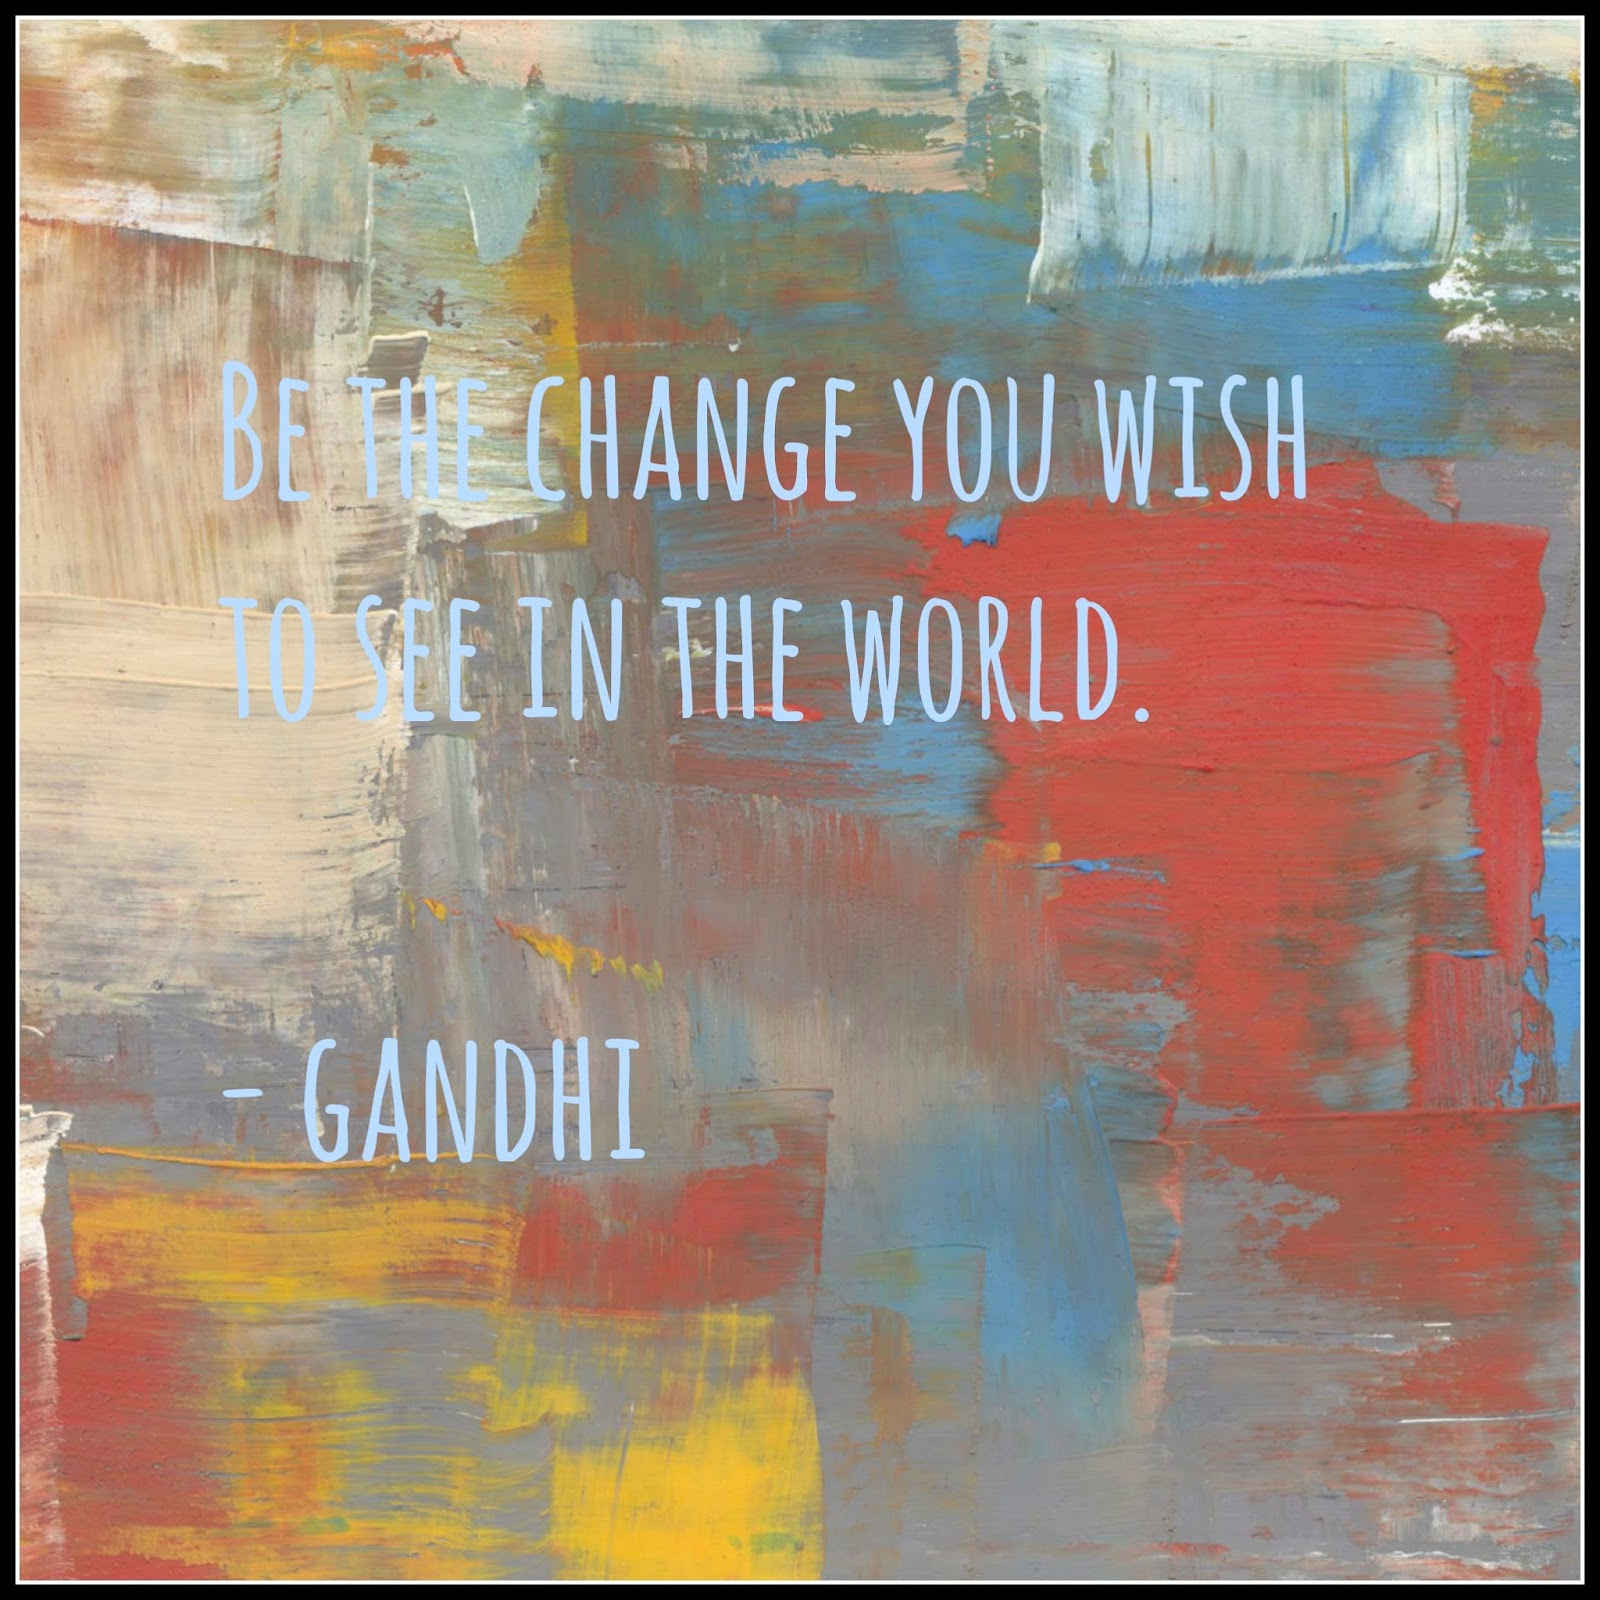 Celebrating Change